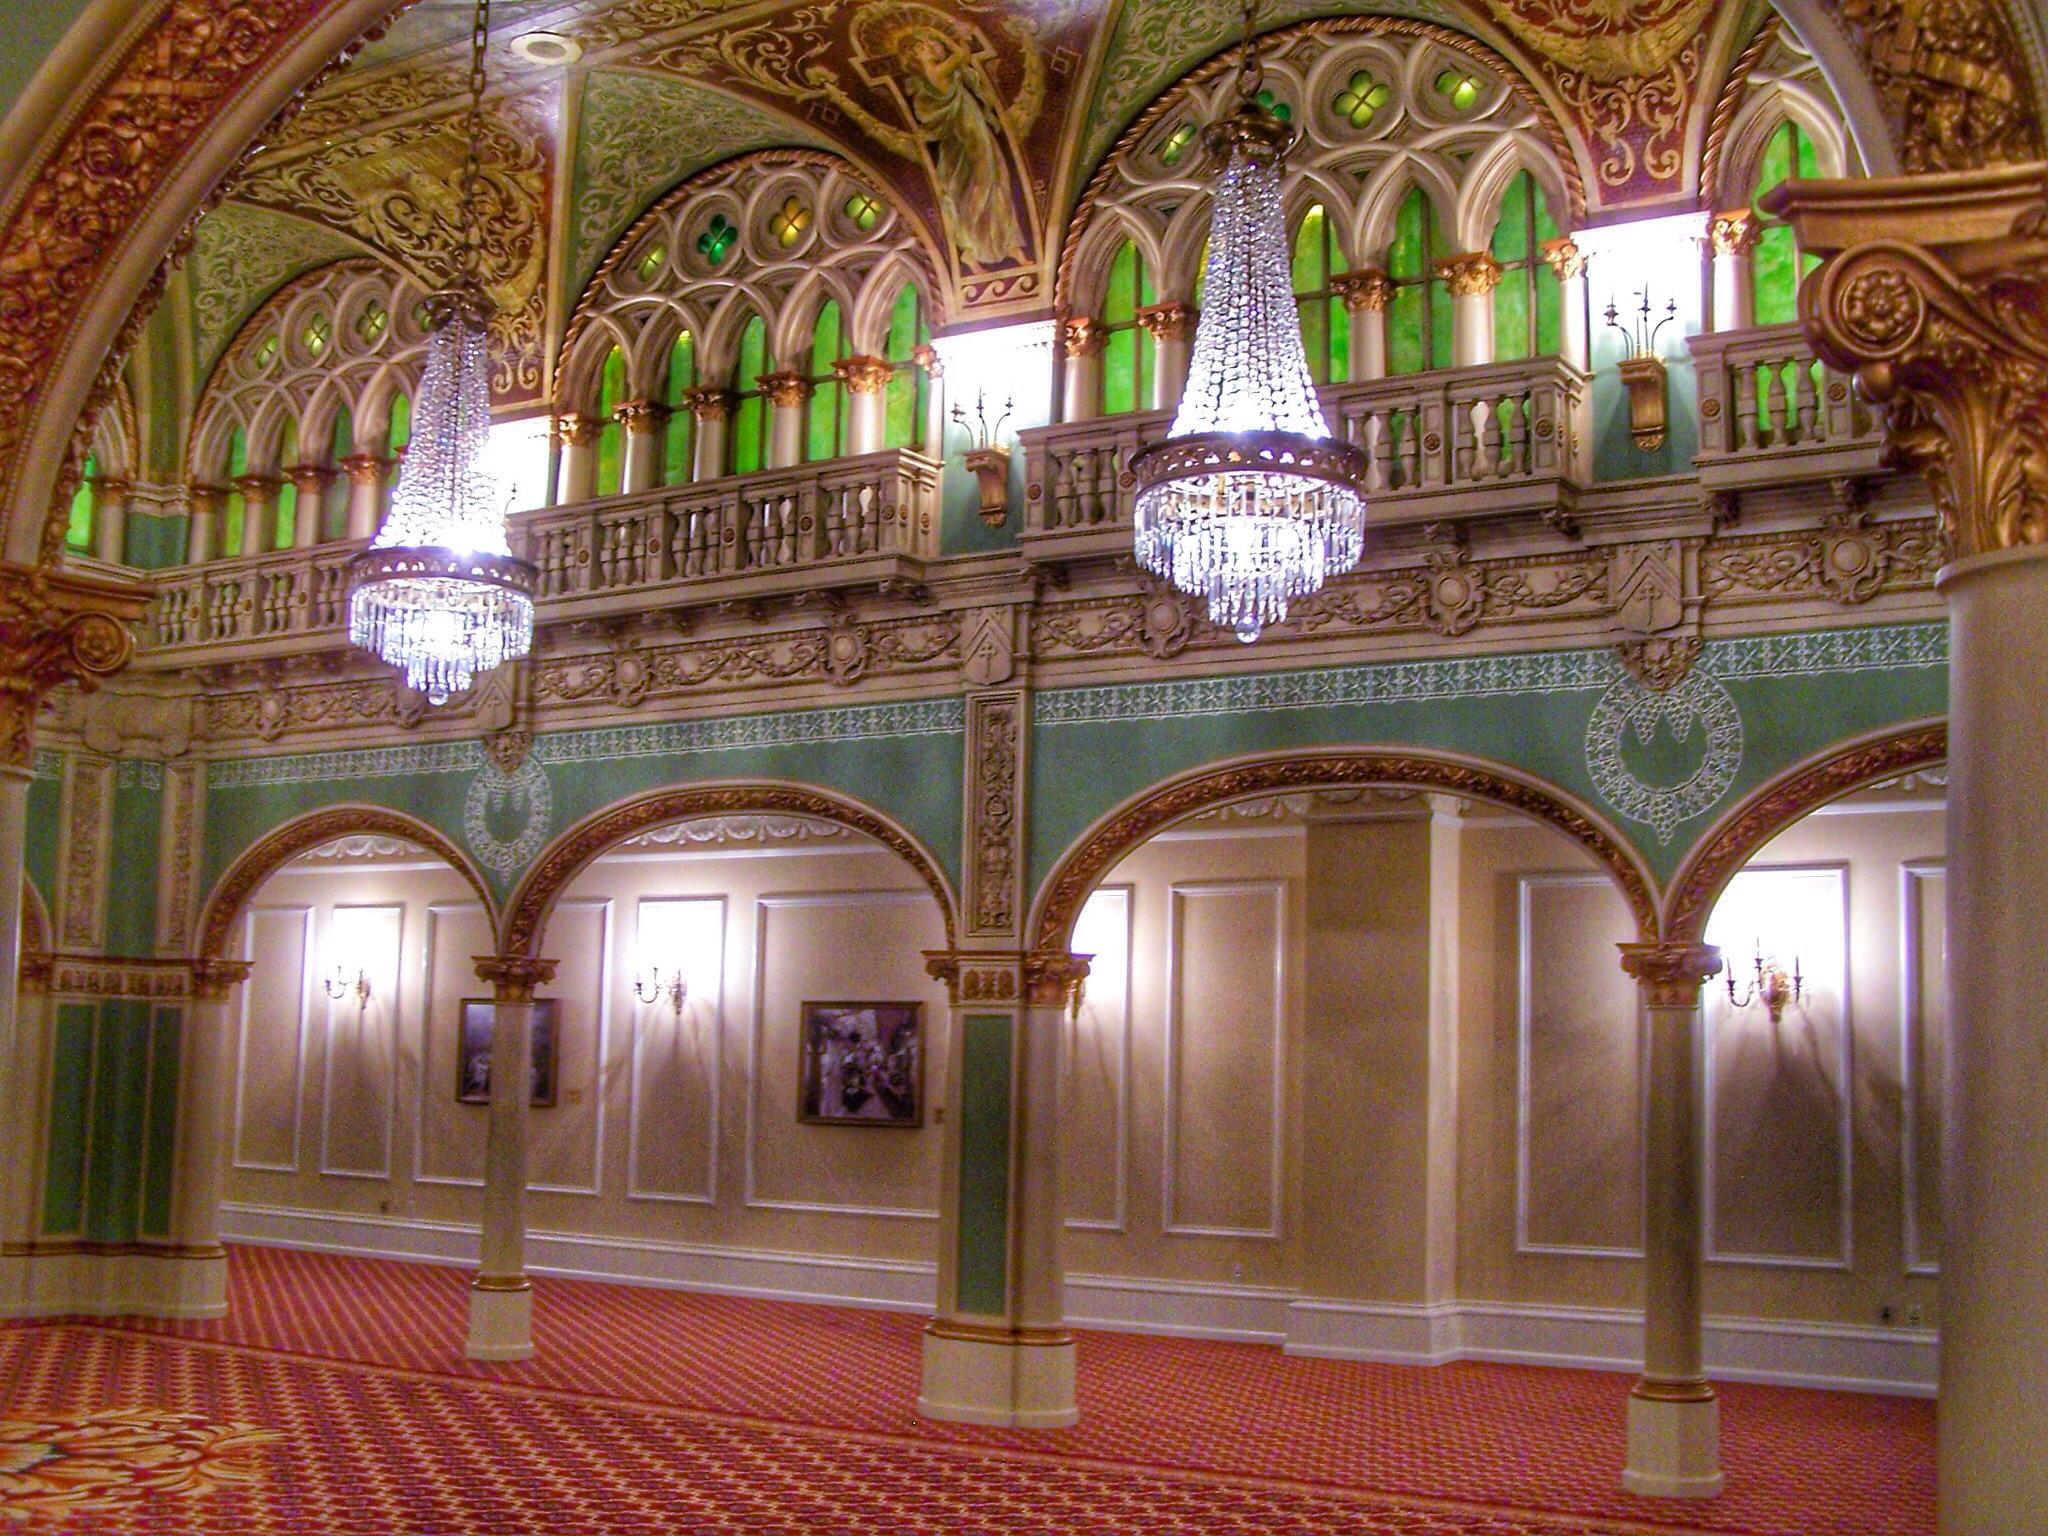 Venice Italy architecture hotel washington spokane state Gothic style grand palace historic ballroom historical venetian restoration